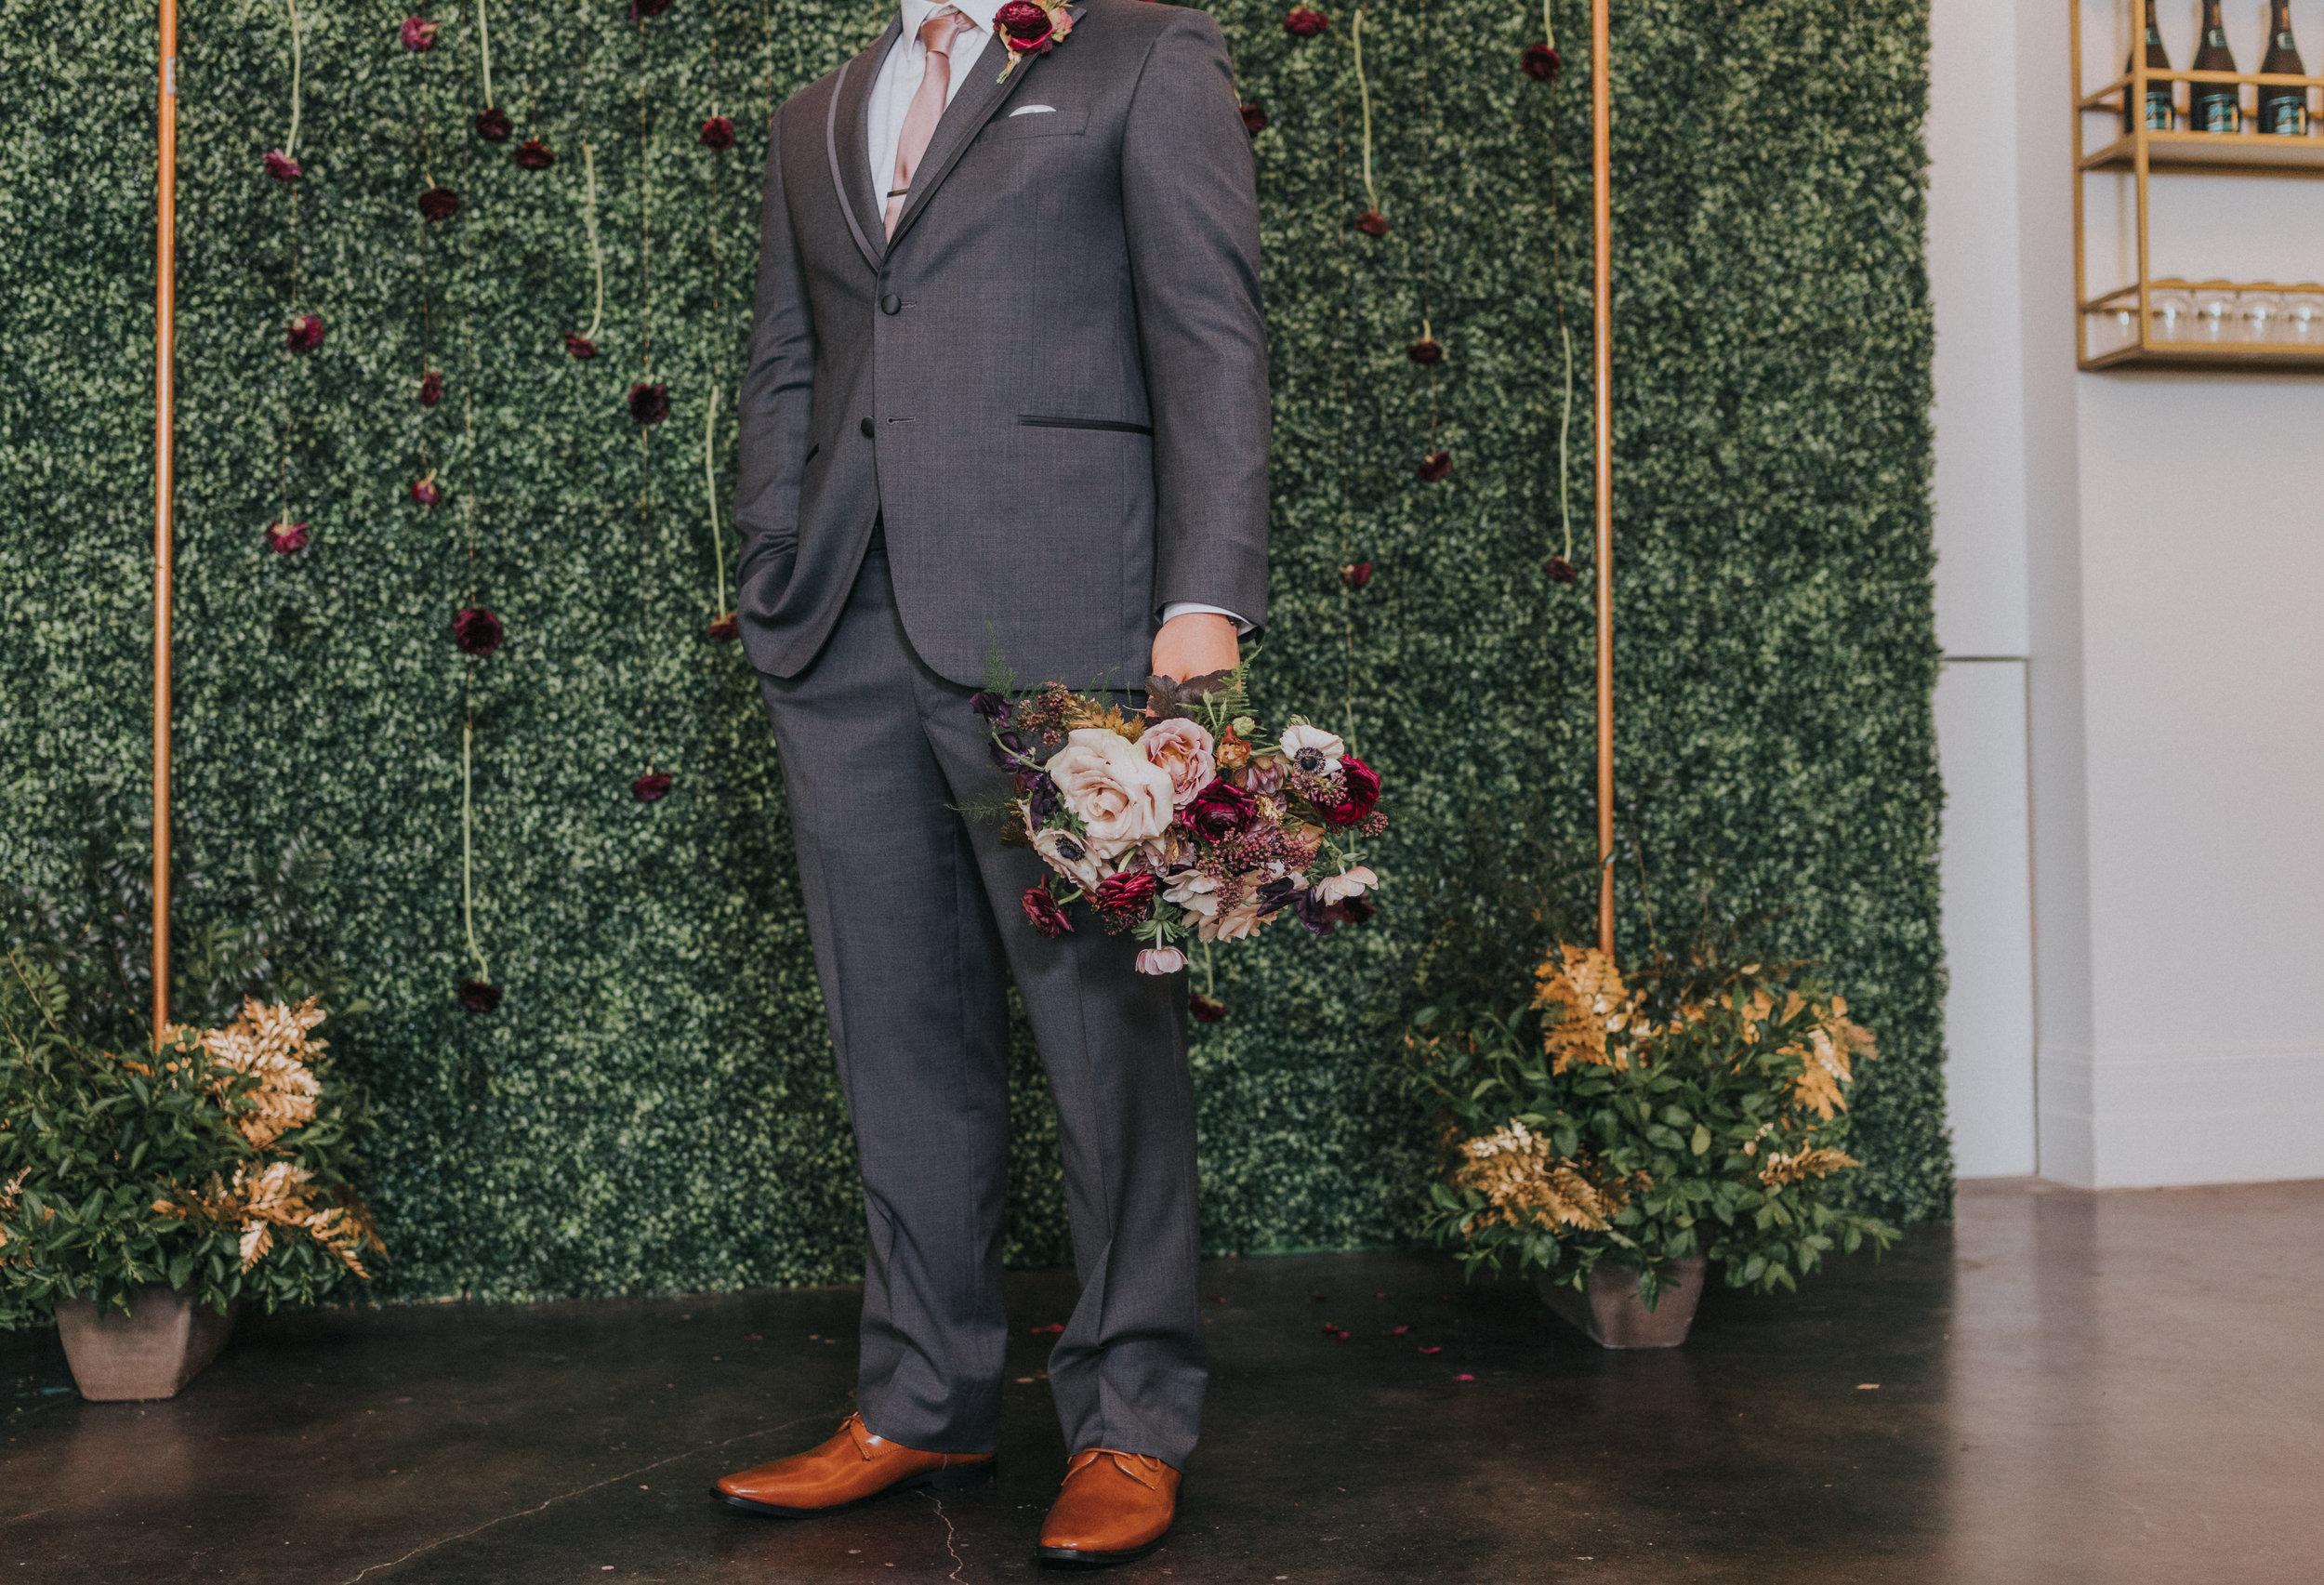 136 tiny-luxe-weddings-omaha-nebraska-midwest-empire-room.jpg